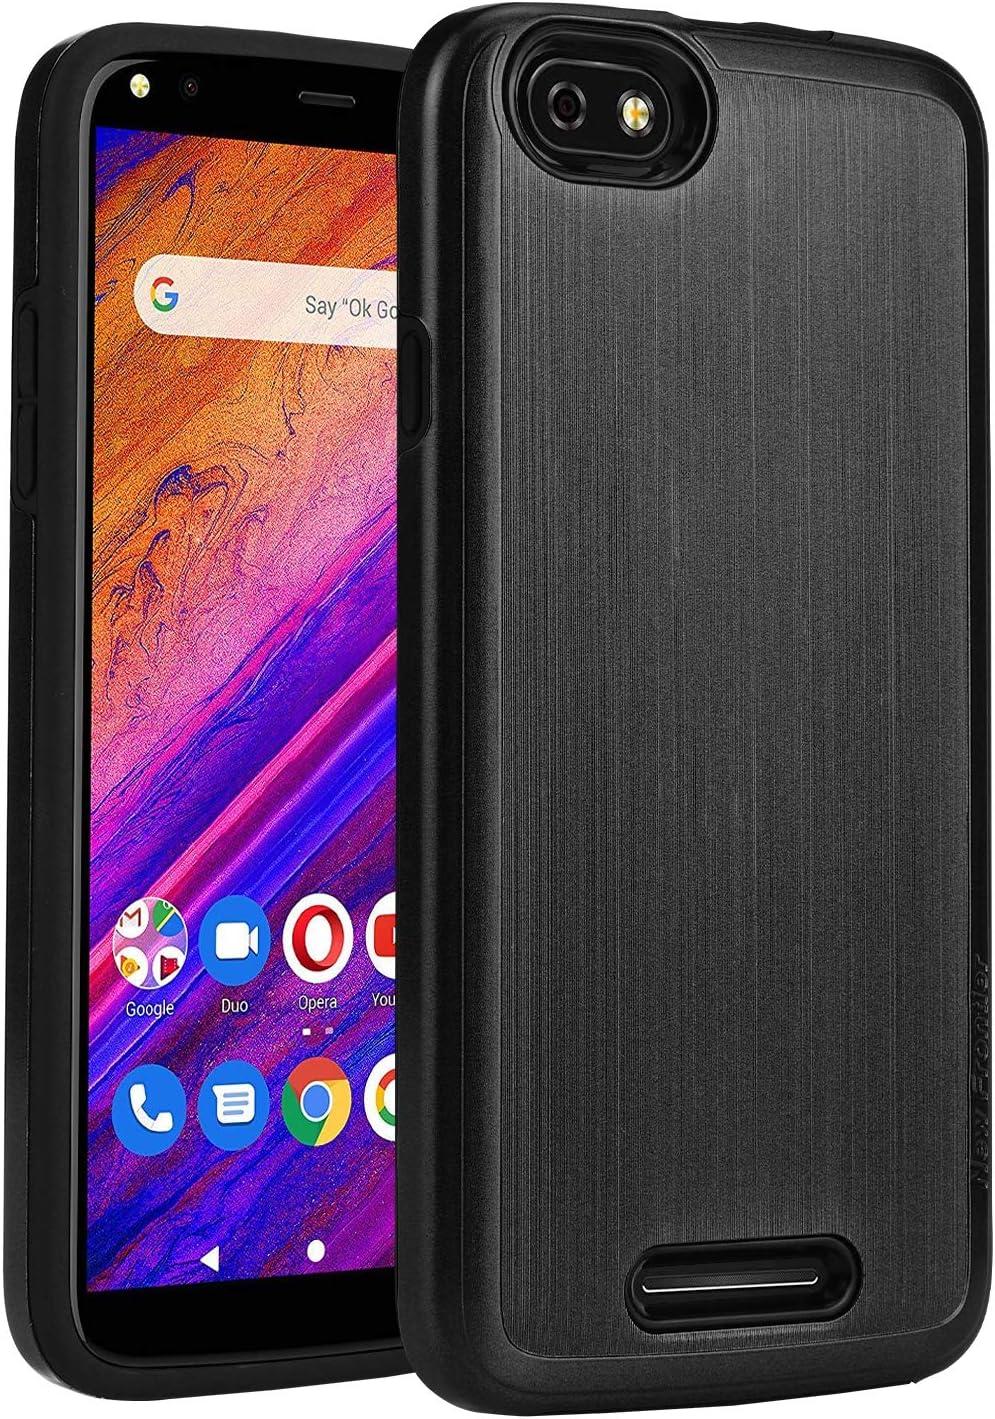 BLU Studio Mega 2019 Case,NEW FRONTIER 100% Slim-Fit [Merge] Strong Protective Shock Proof Dual Layer Precise Cutouts Bumper Style Phone Case for BLU Studio Mega 2019 (Black)